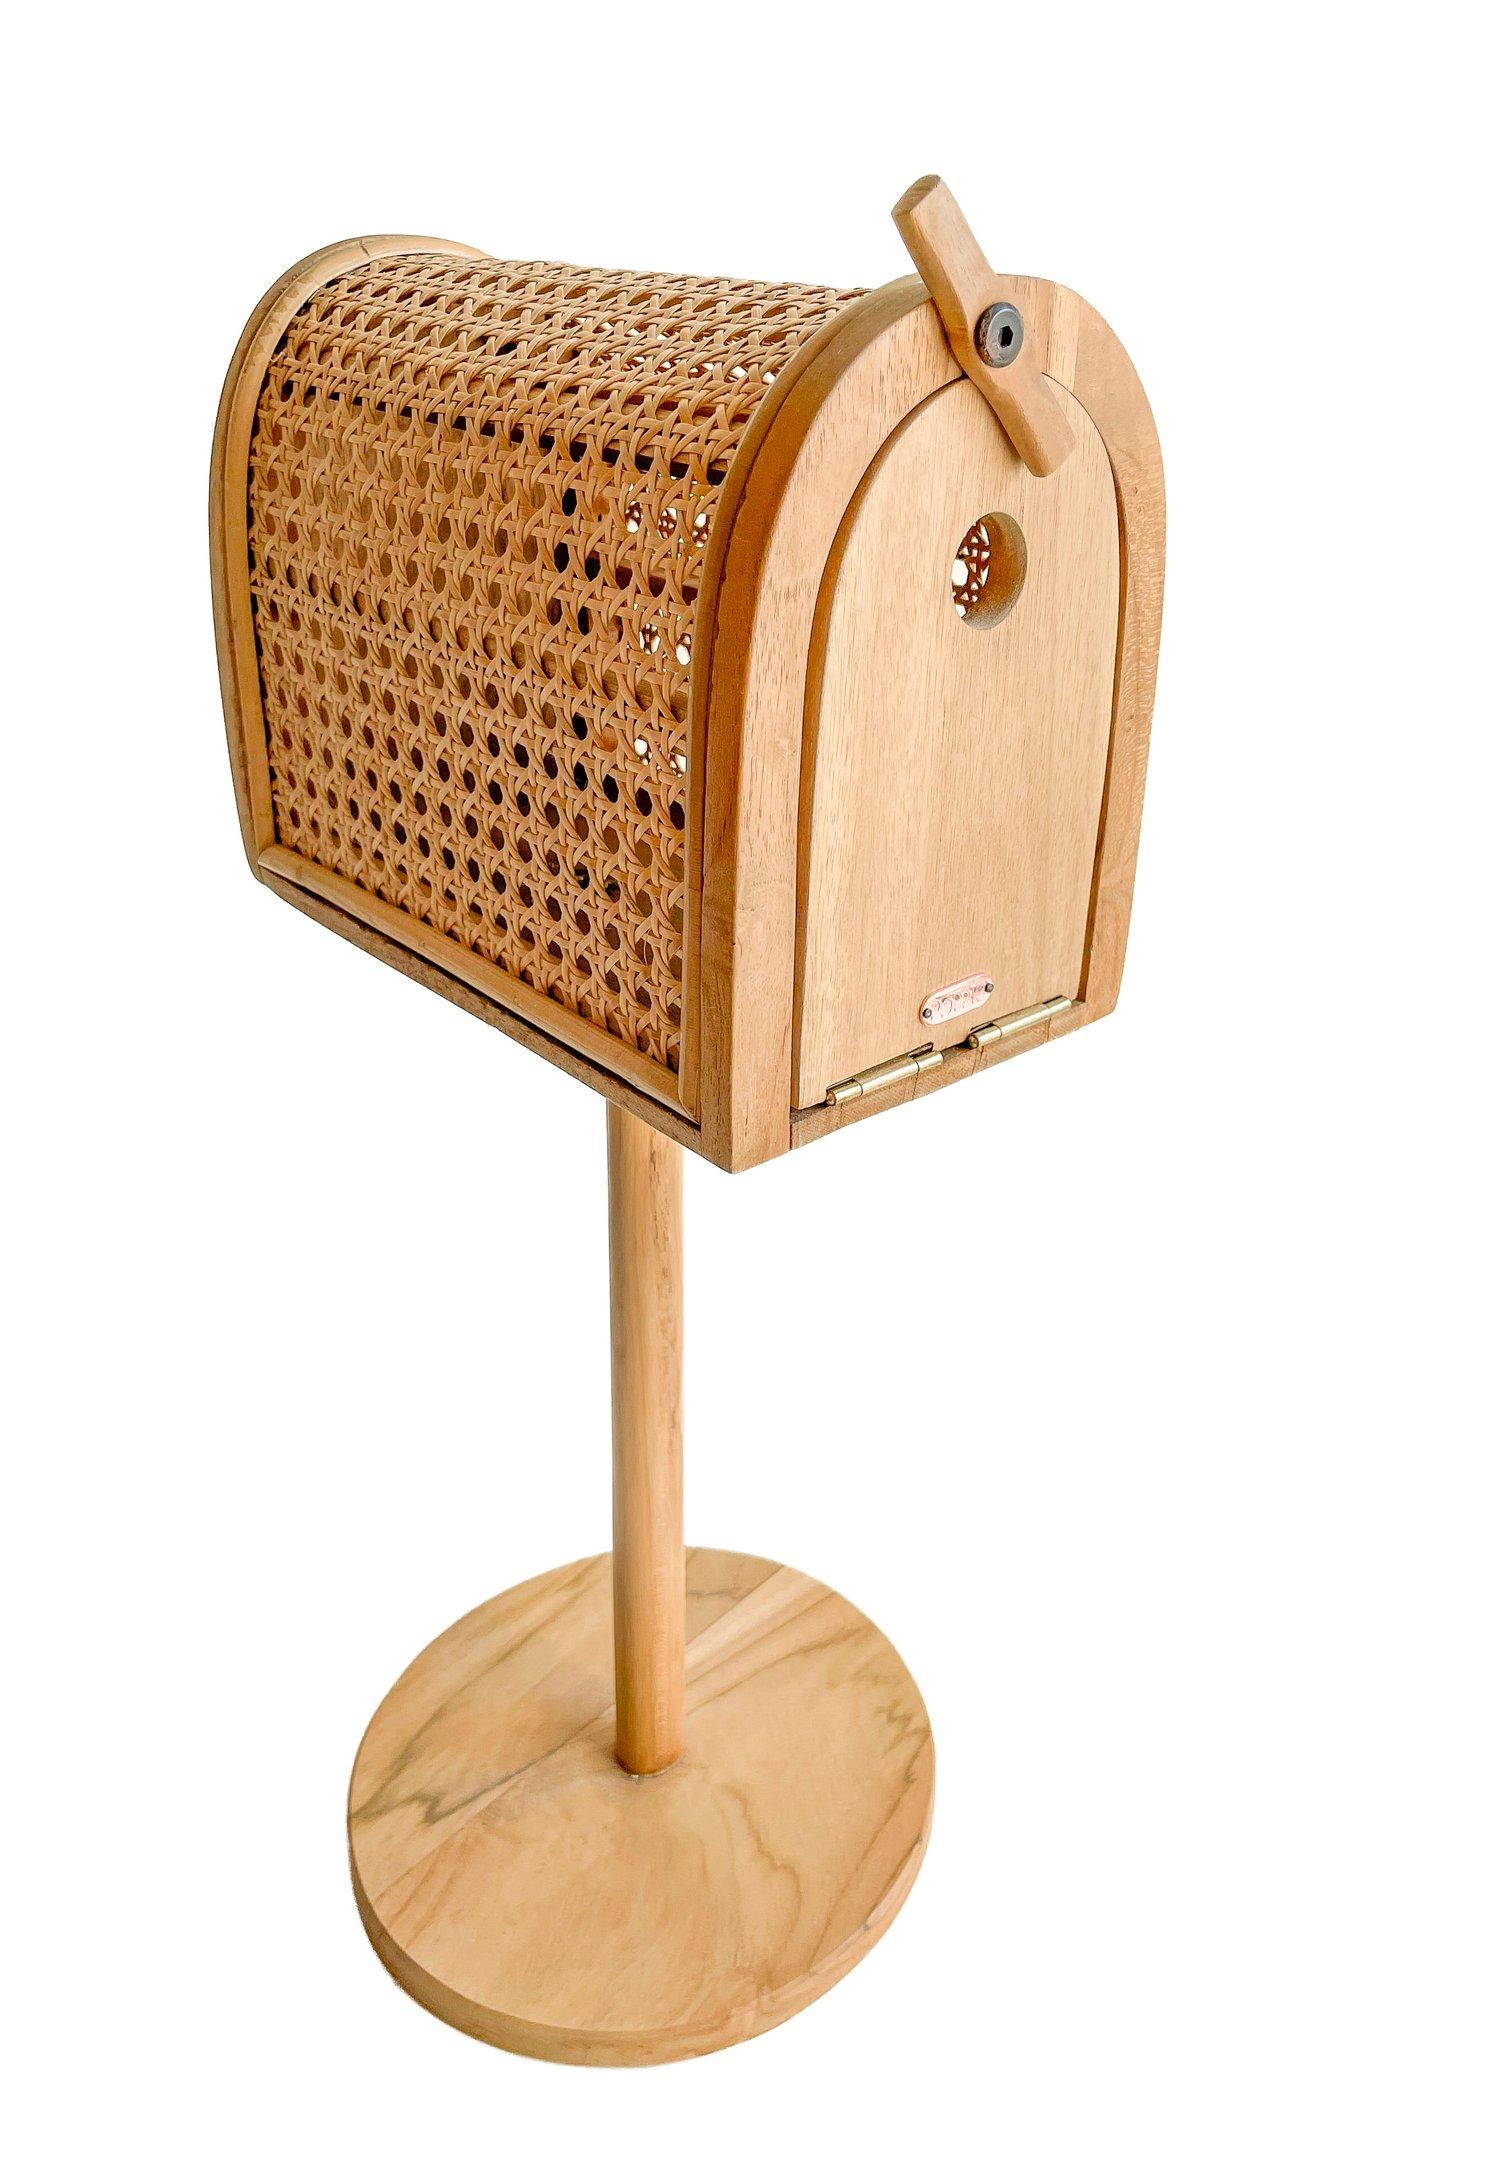 Image of Pre-order for Nov - Poppie Mail Box